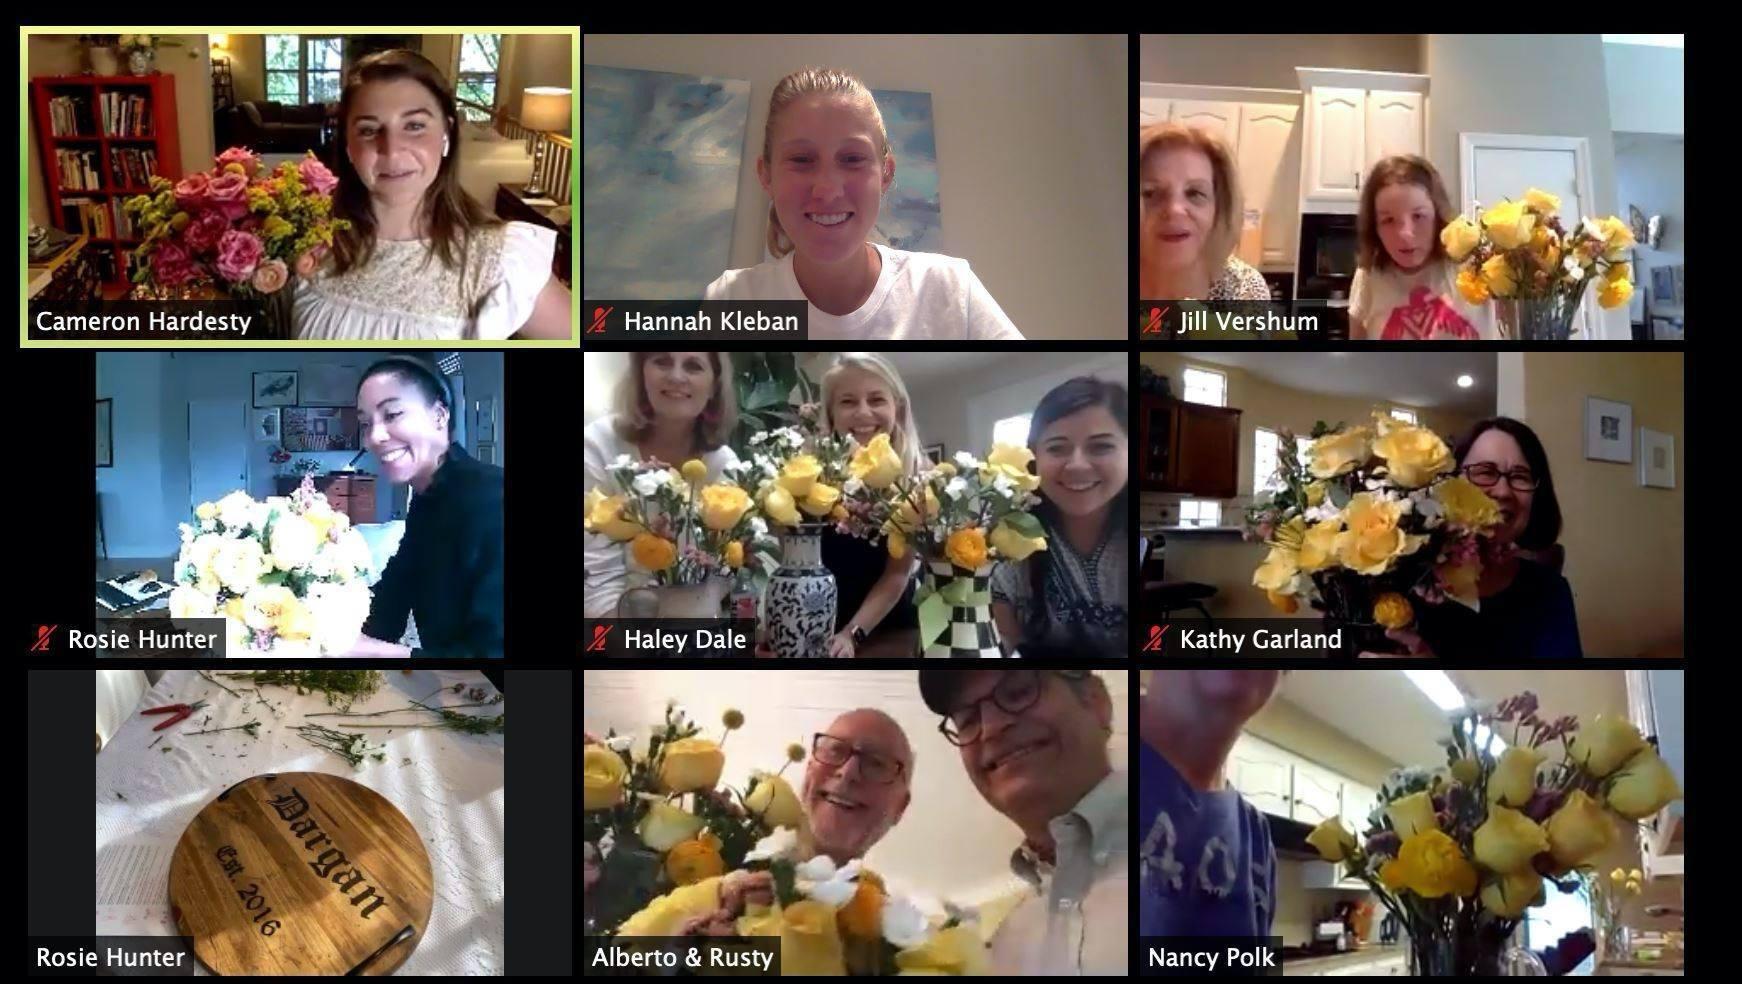 Virtual flower arranging workshop through Poppy Flowers